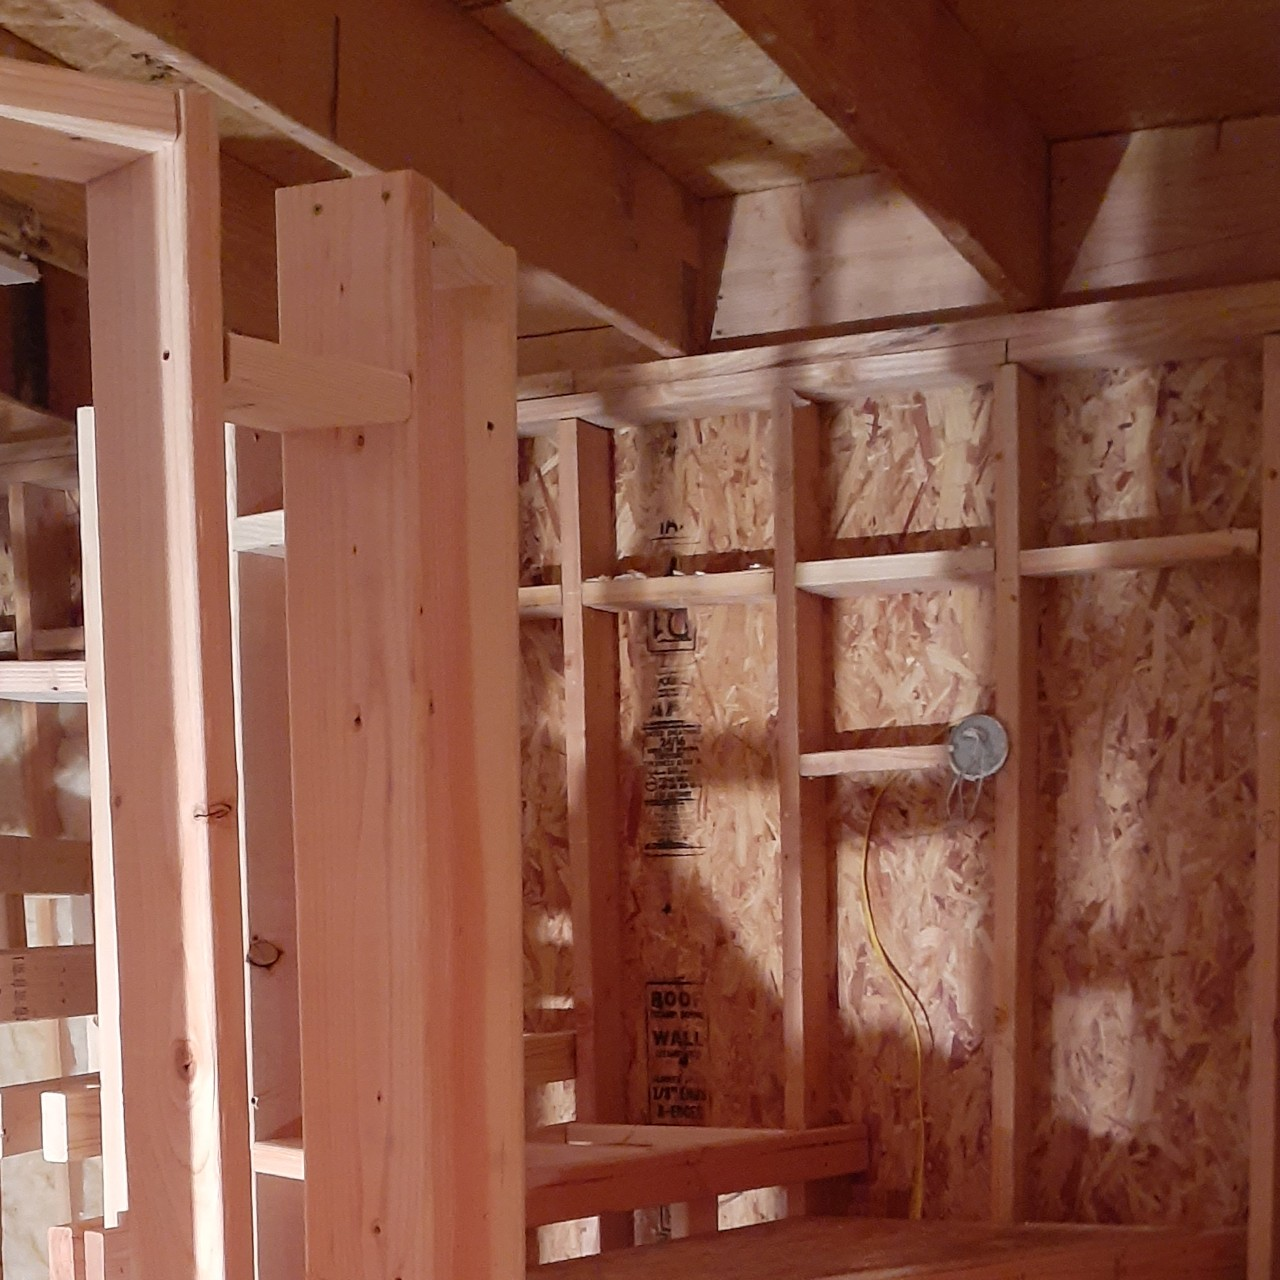 carpentry-wood-framing-second-floor-home-addition--framing-21